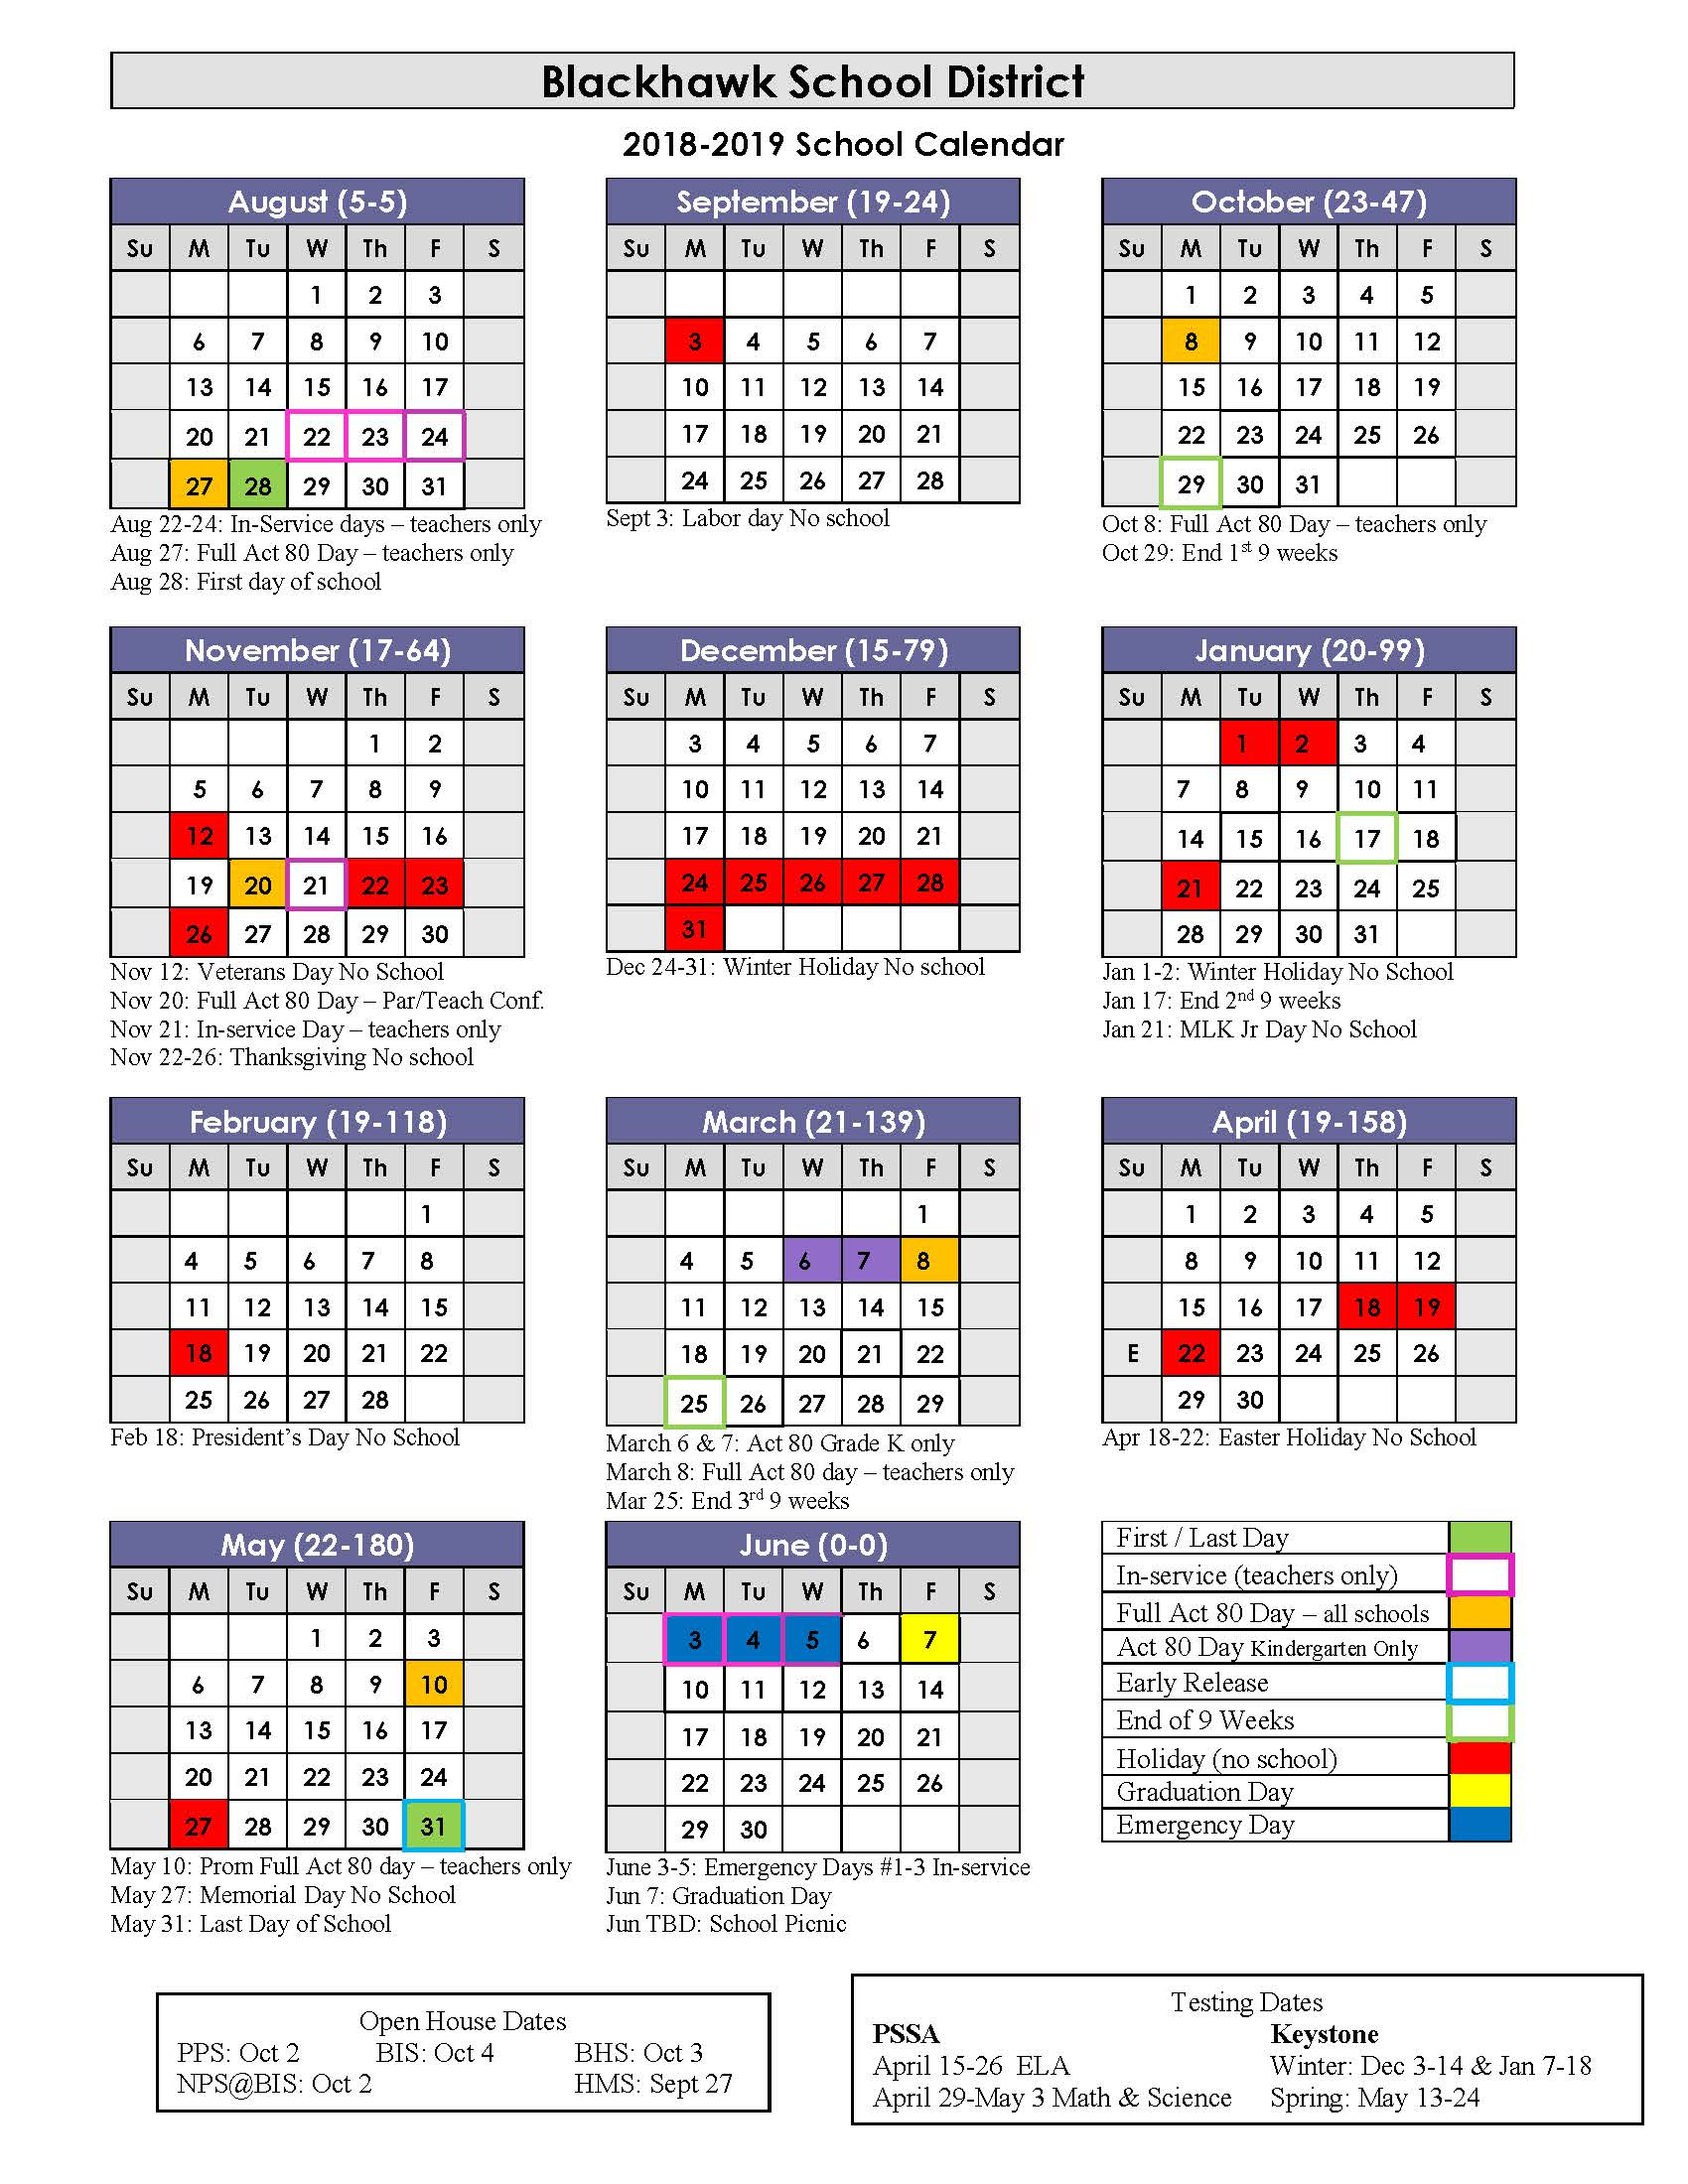 Blackhawk School District With Sioux Falls School District Calendar 2021 20